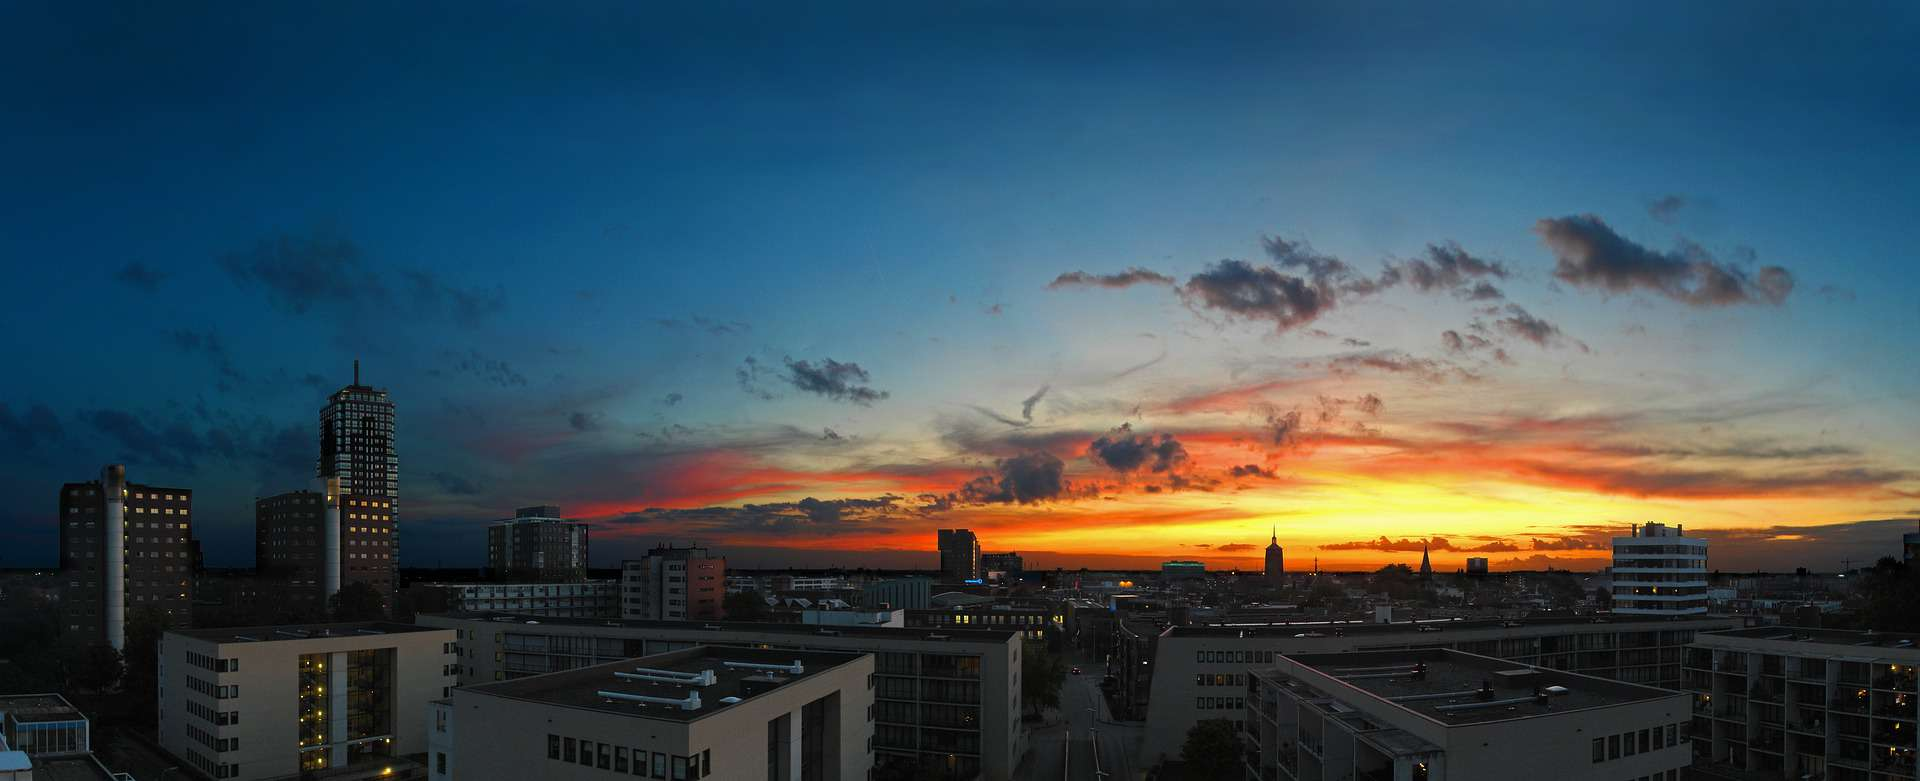 zonnepanelen in Enschede